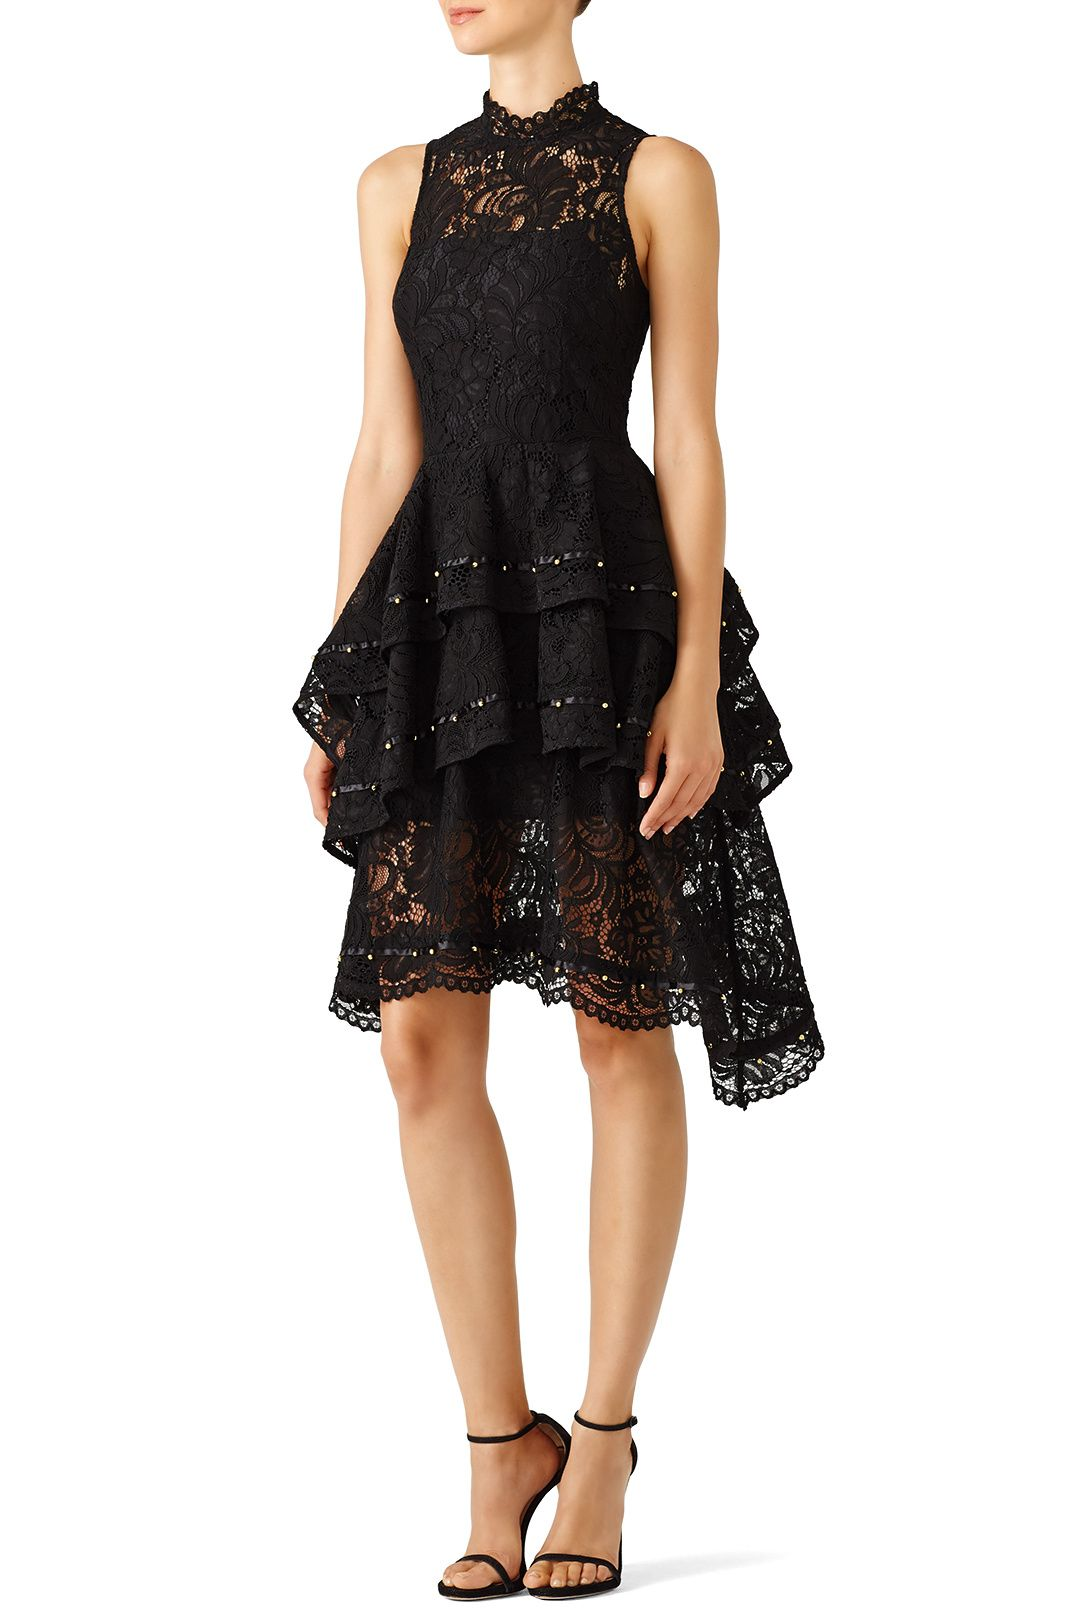 Rent Black Star Crossed Dress By Keepsake For 35 Only At Rent The Runway Black High Low Dresses Dresses Black Star